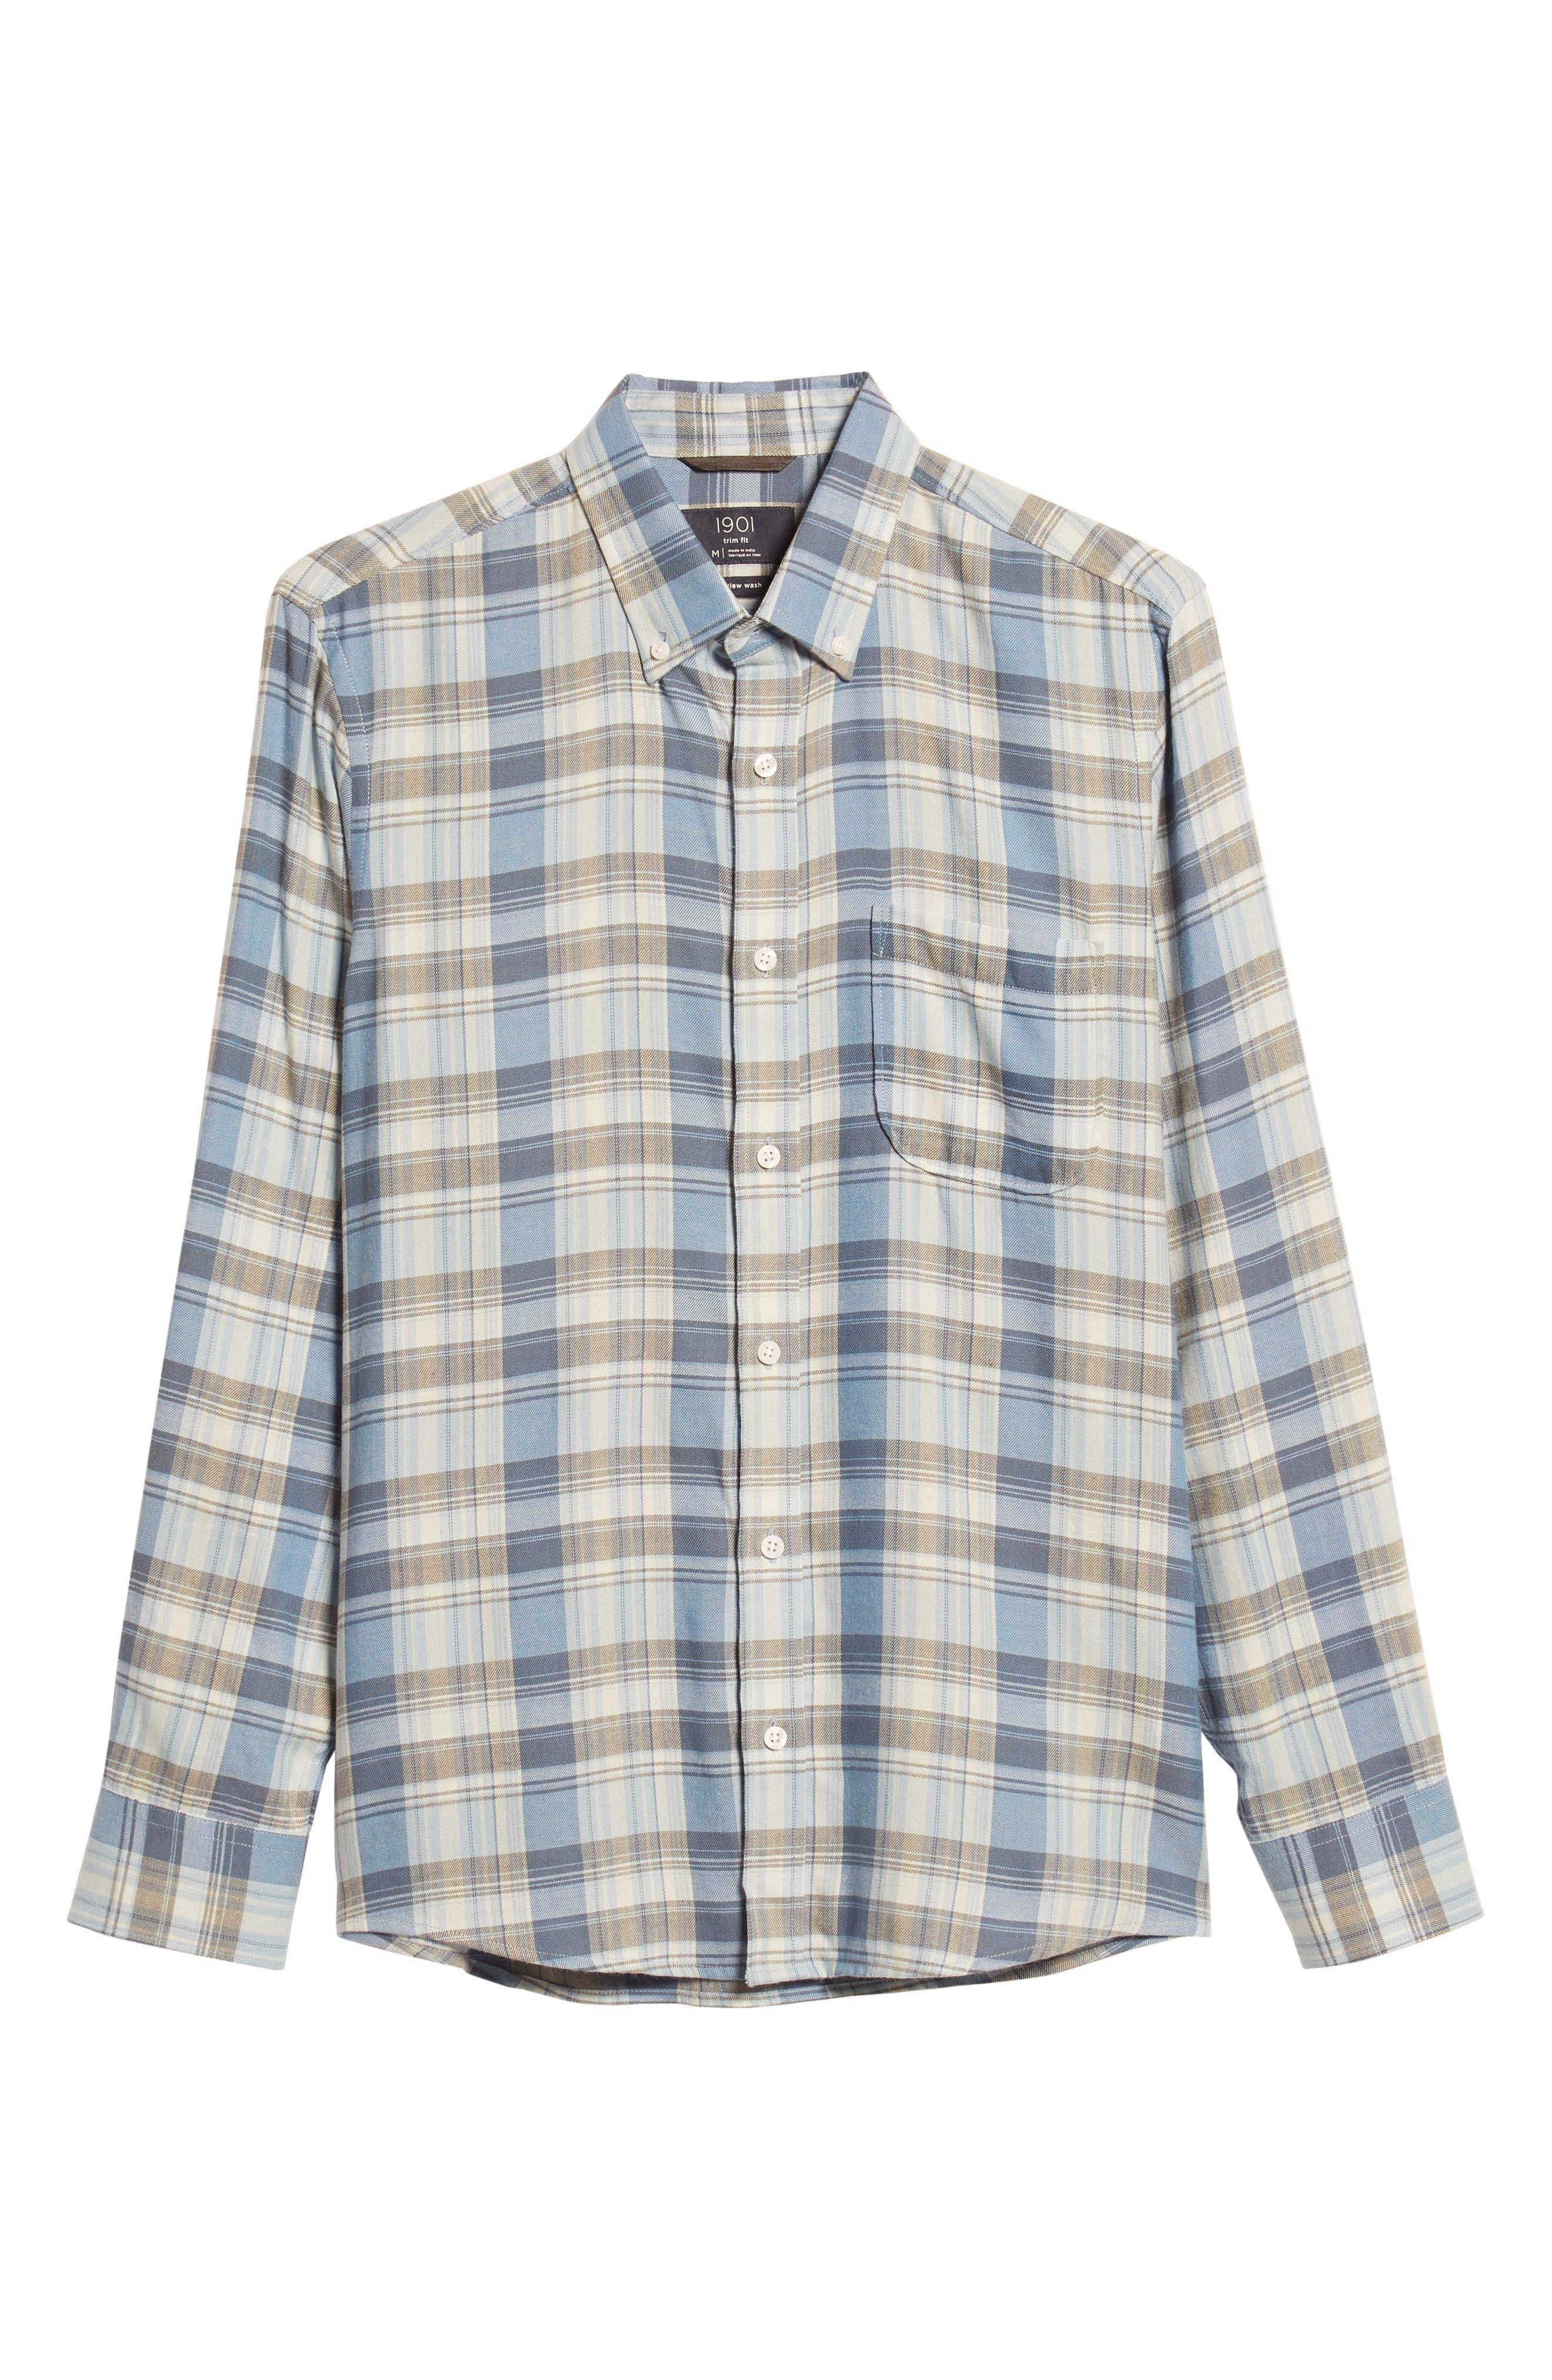 Slim Fit Plaid Sport Shirt,                             Alternate thumbnail 5, color,                             BLUE CHAMBRAY BLUE DARK PLAID